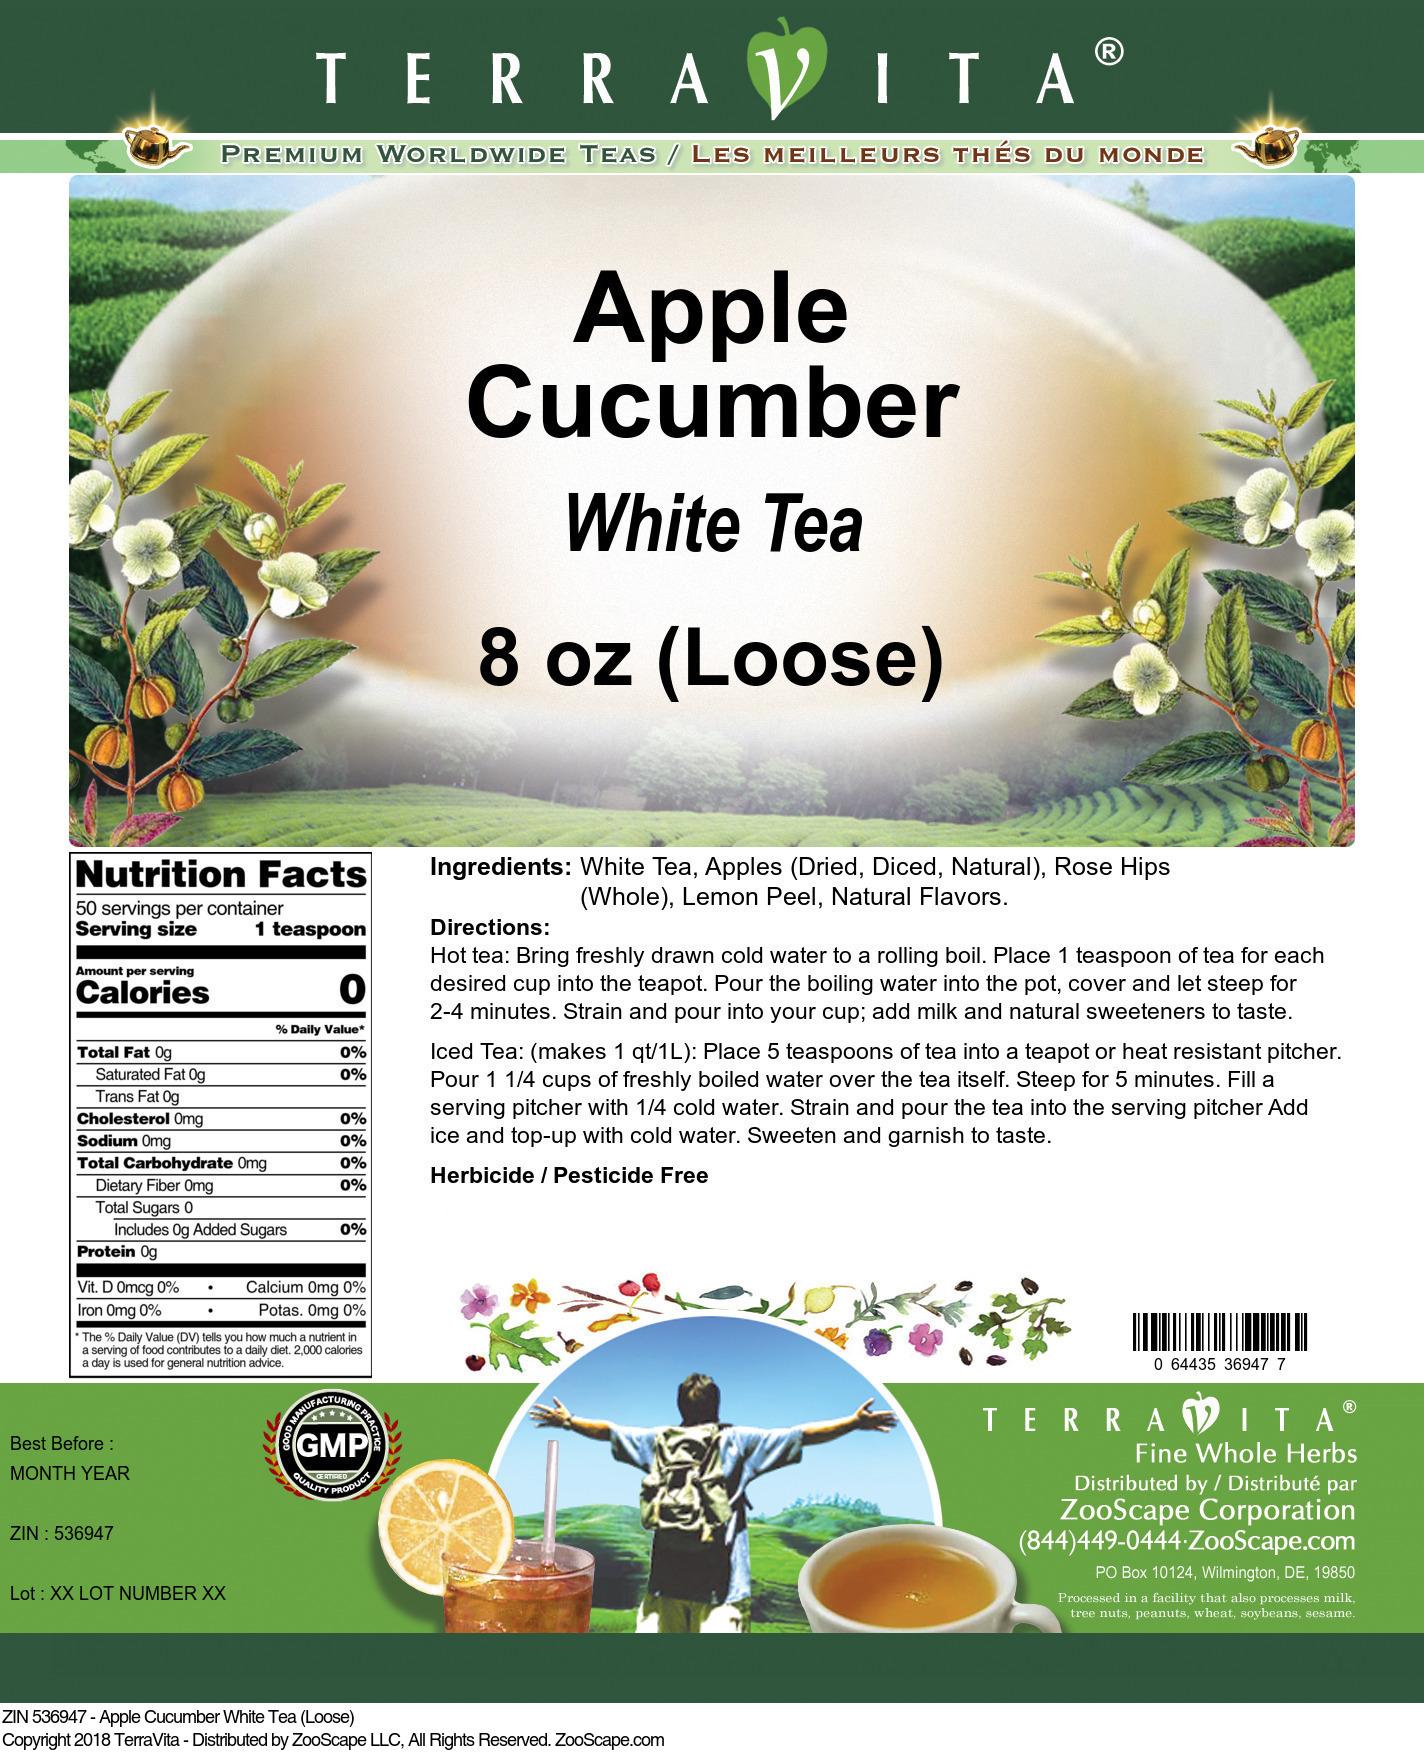 Apple Cucumber White Tea